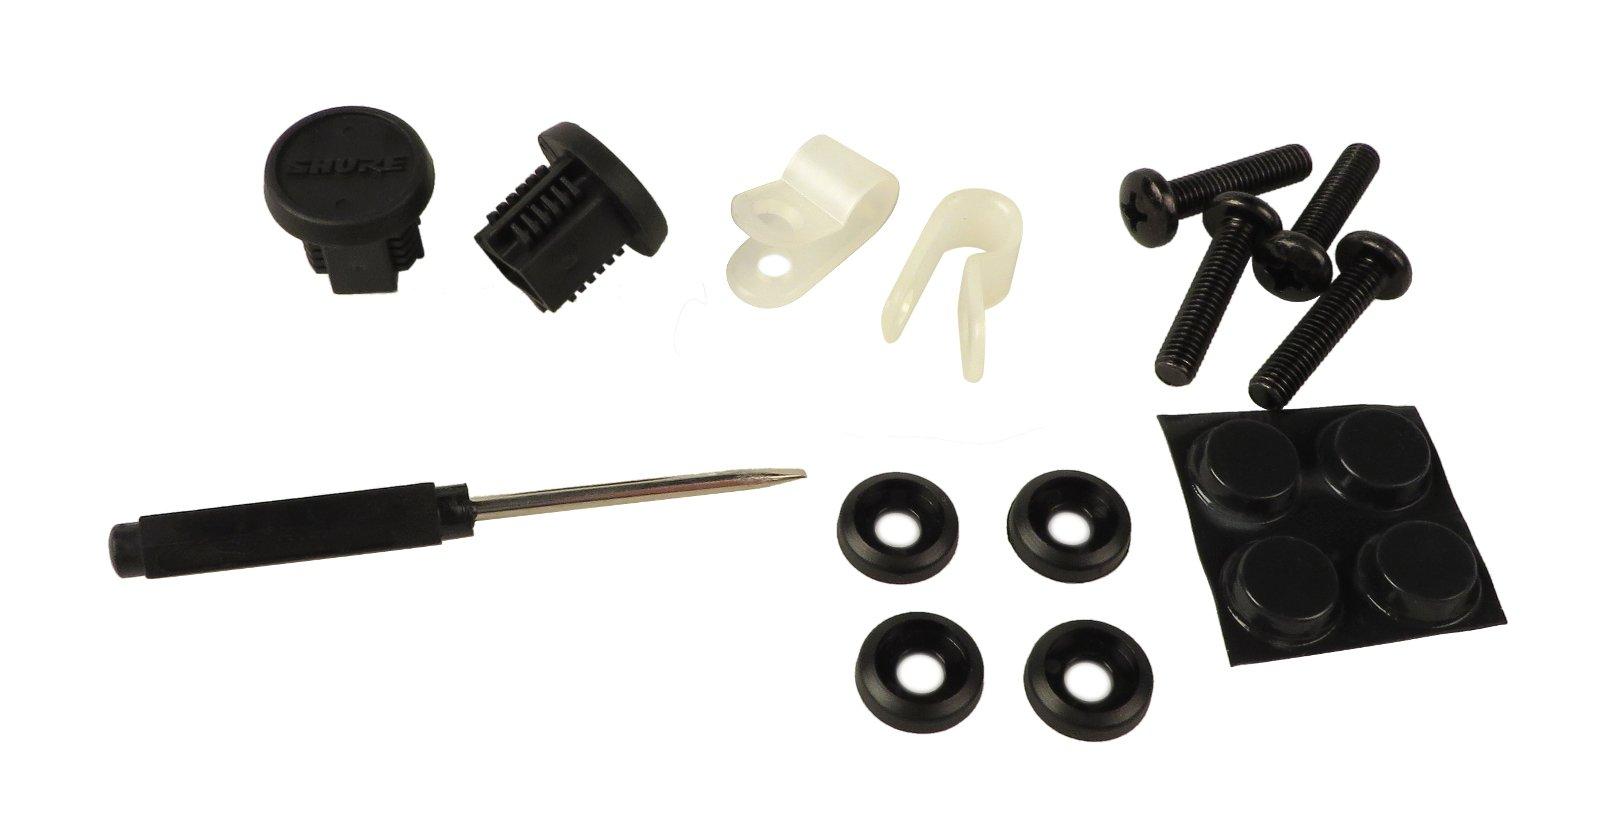 UA844SWB Hardware Kit